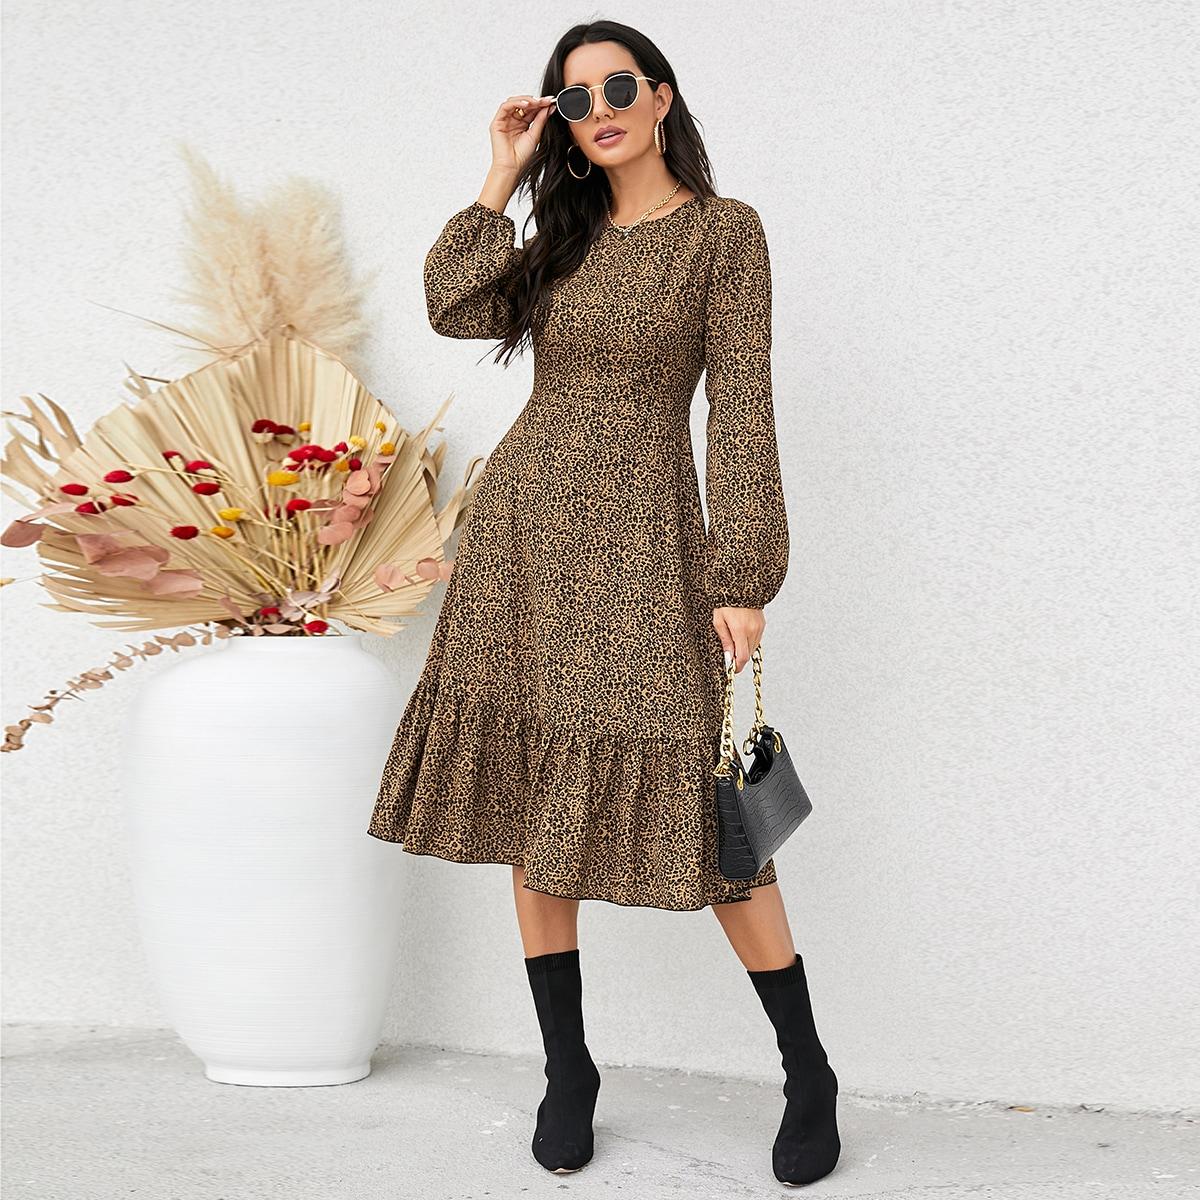 Leopard Print Ruffle Hem A-line Dress